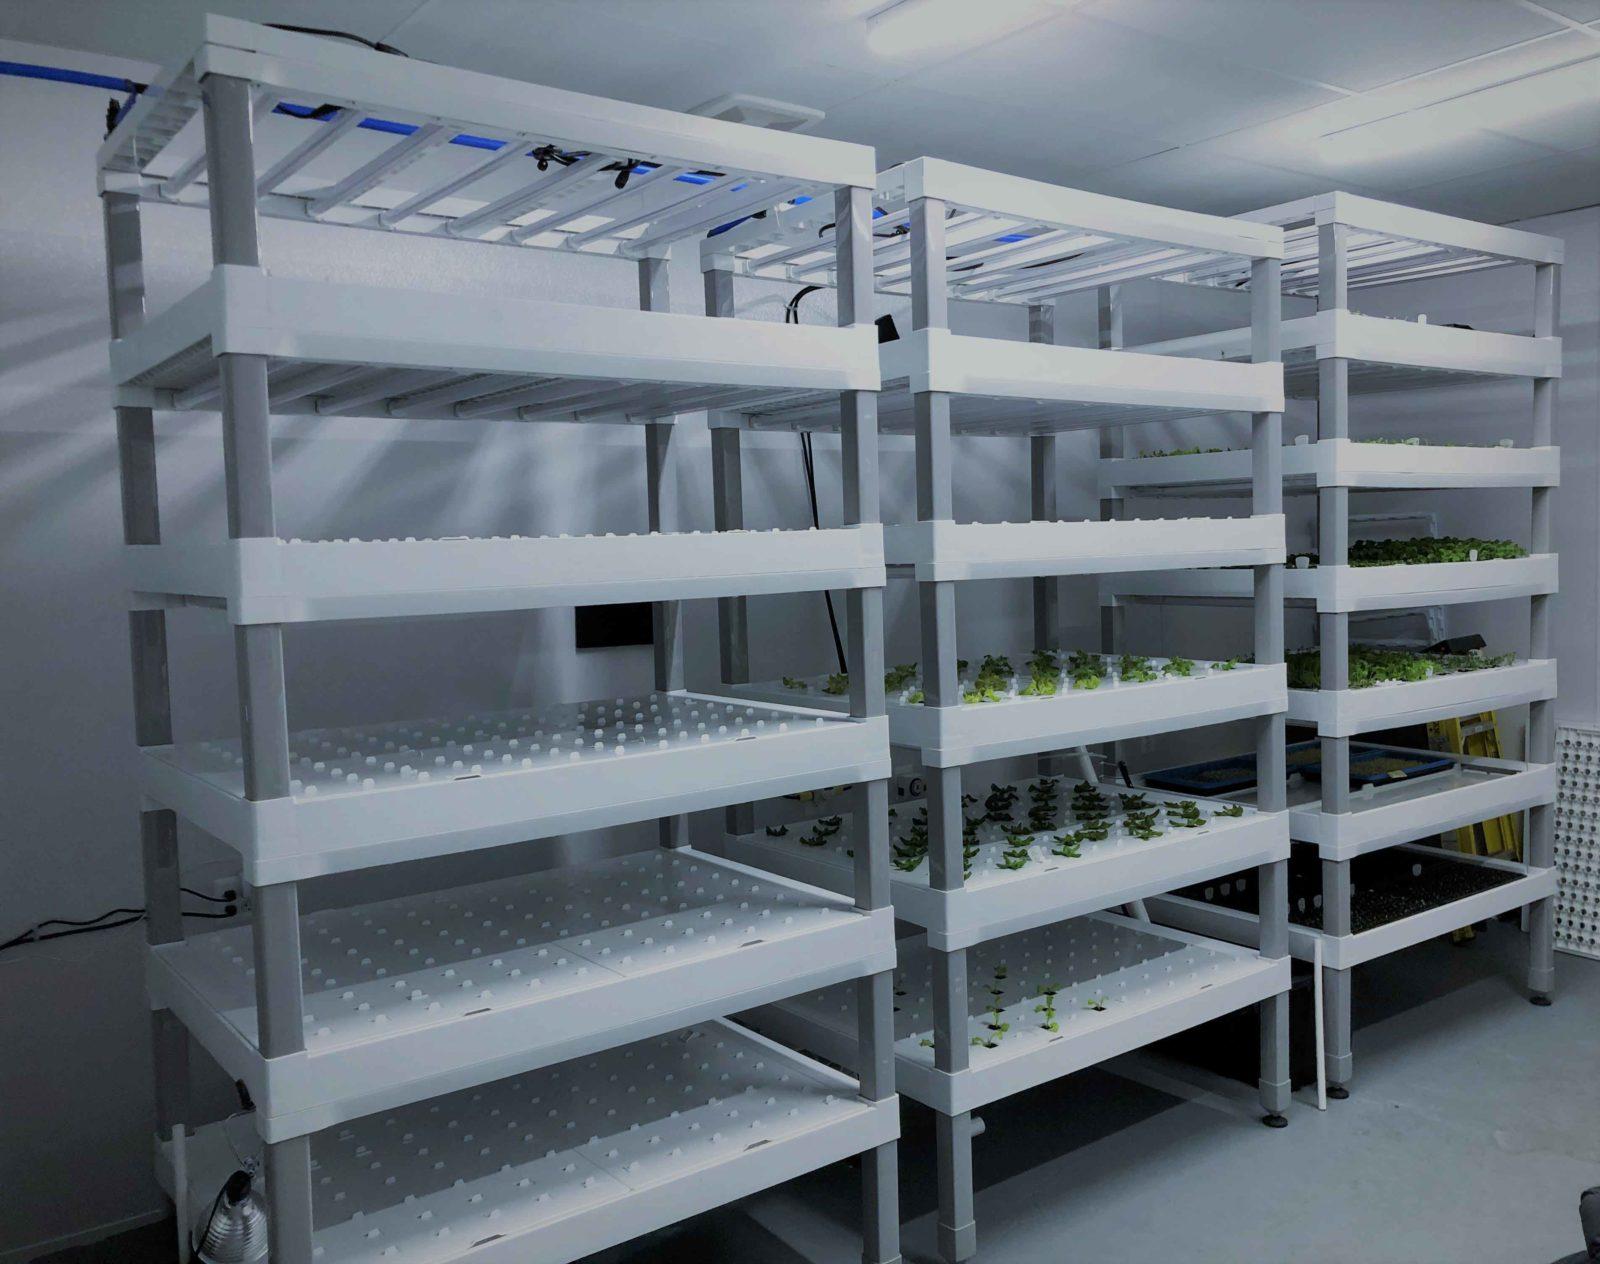 Vertical farm full operating growing racks